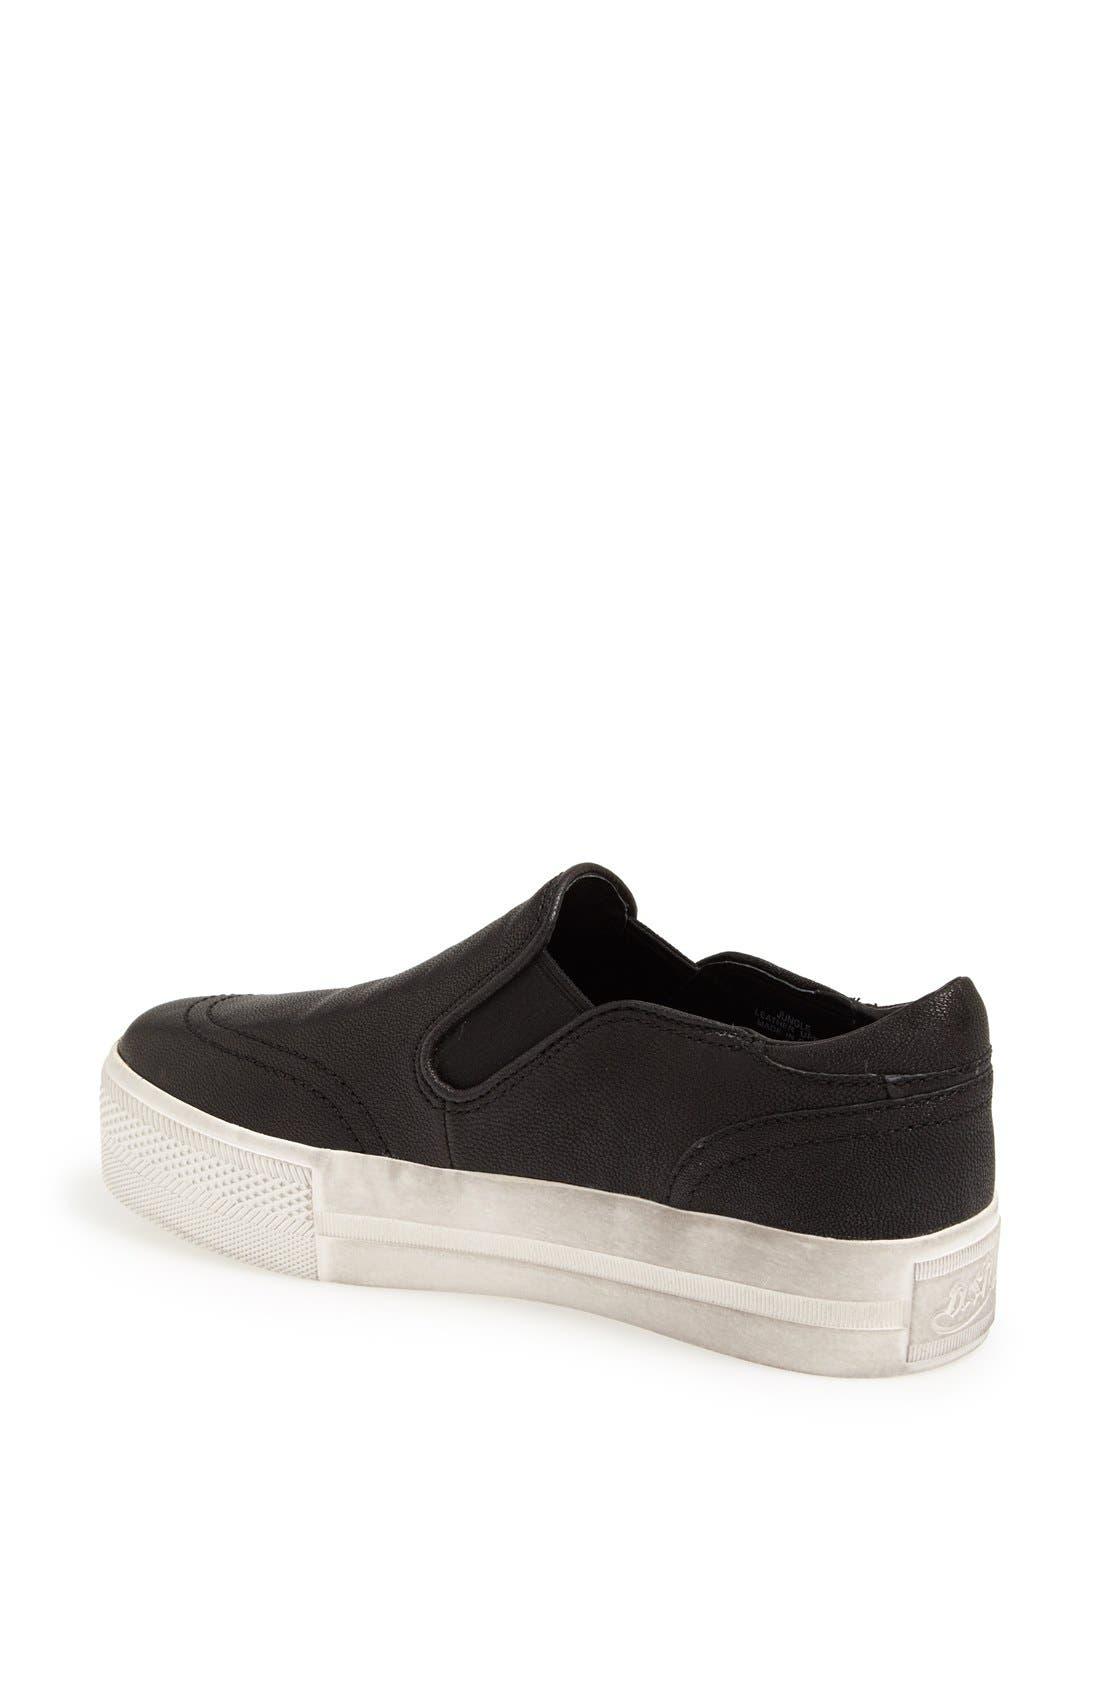 'Jungle' Platform Sneaker,                             Alternate thumbnail 2, color,                             001